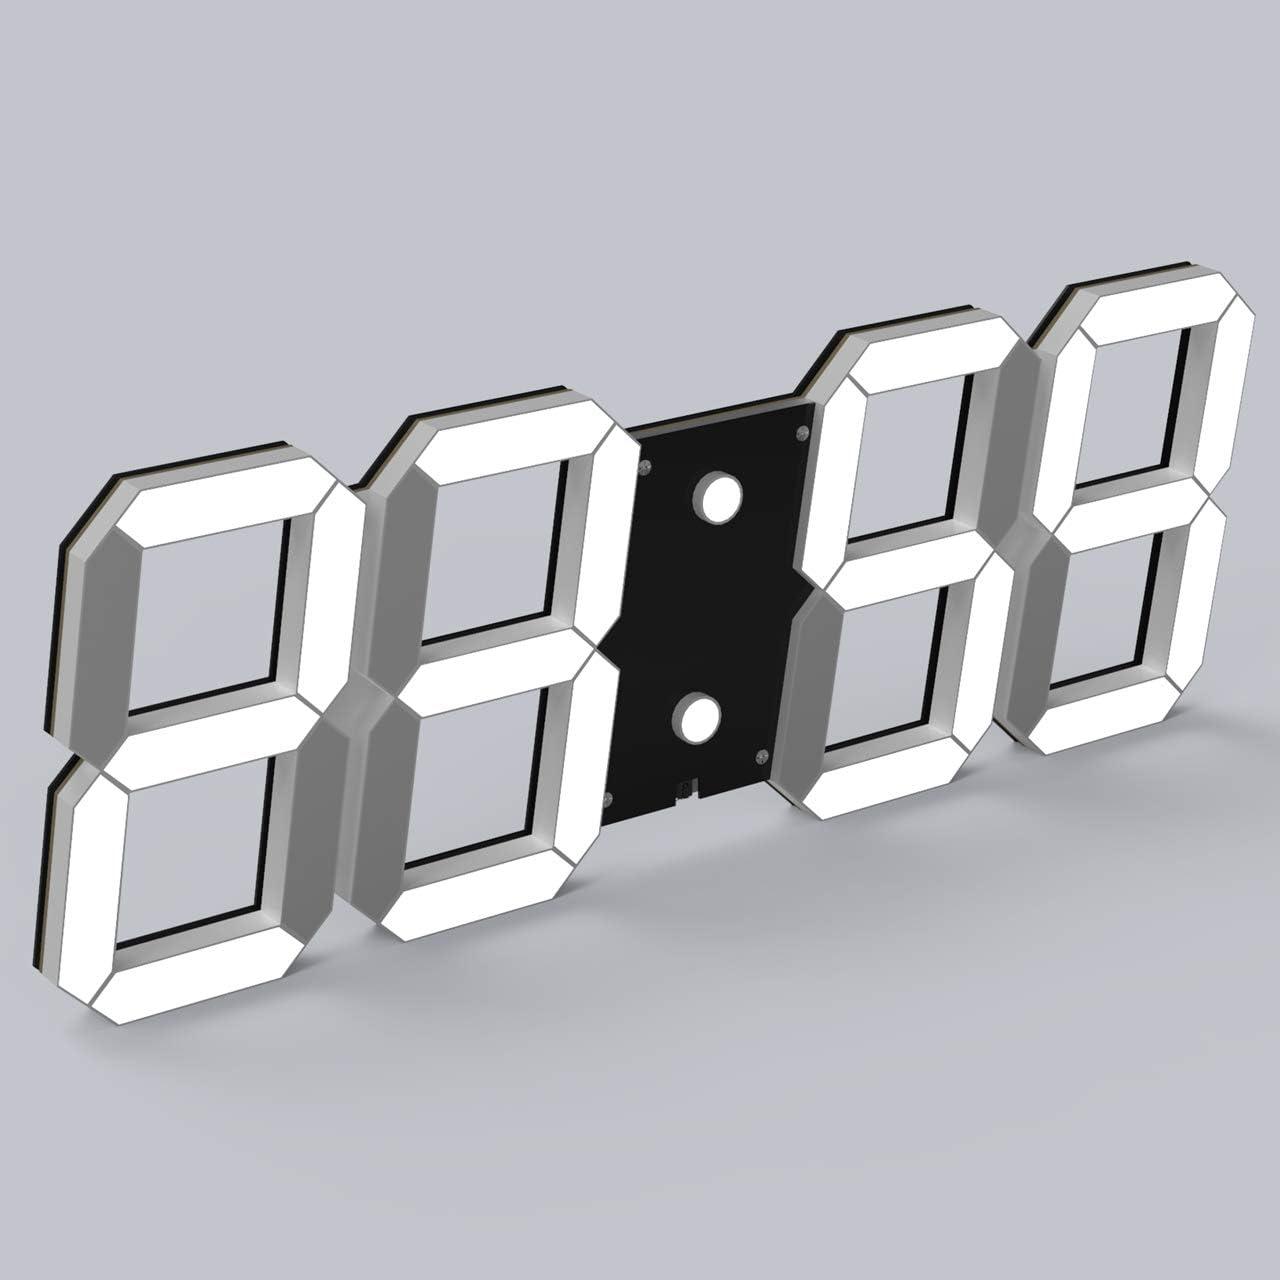 CHKOSDA 3D Digital Wall Clock, 6 LED Numbers Countdown Clock, Remote Control, Ultra-Thin Design, Large Calendar, Auto Dimmer 8-Level Adjustable Brightness Office Clock Black Shell, White